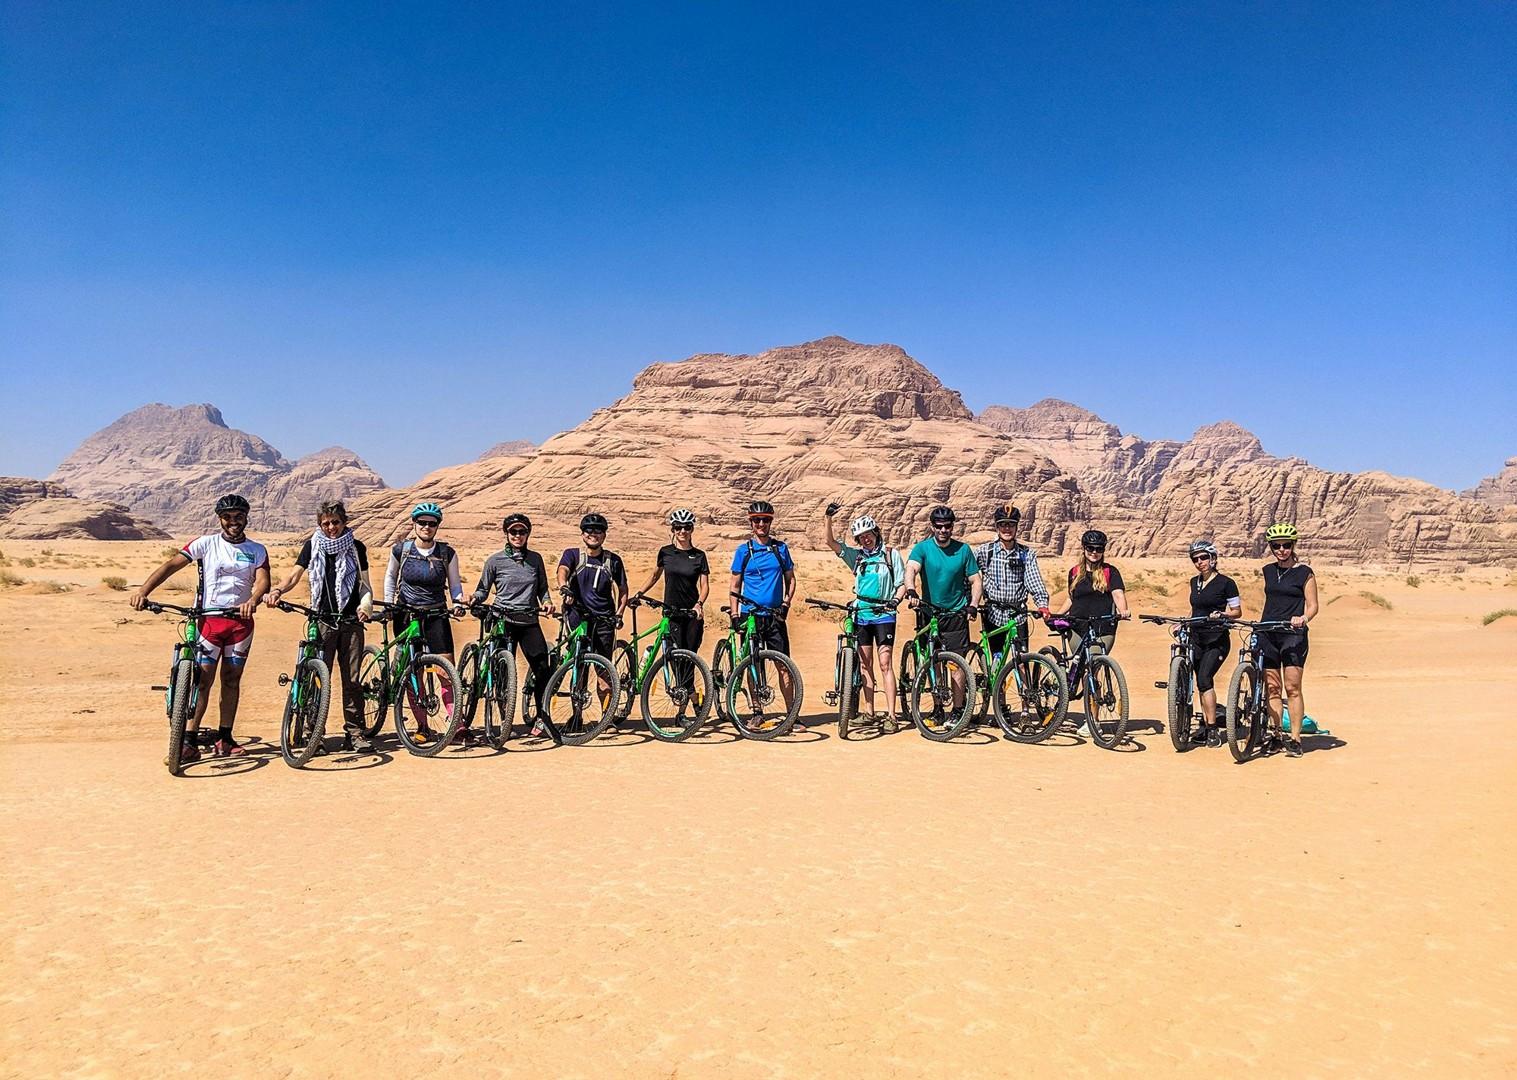 IMG_20190420_101030.jpg - NEW! Jordan - Petra, Wadi Rum & the Dead Sea - Cycling Adventures